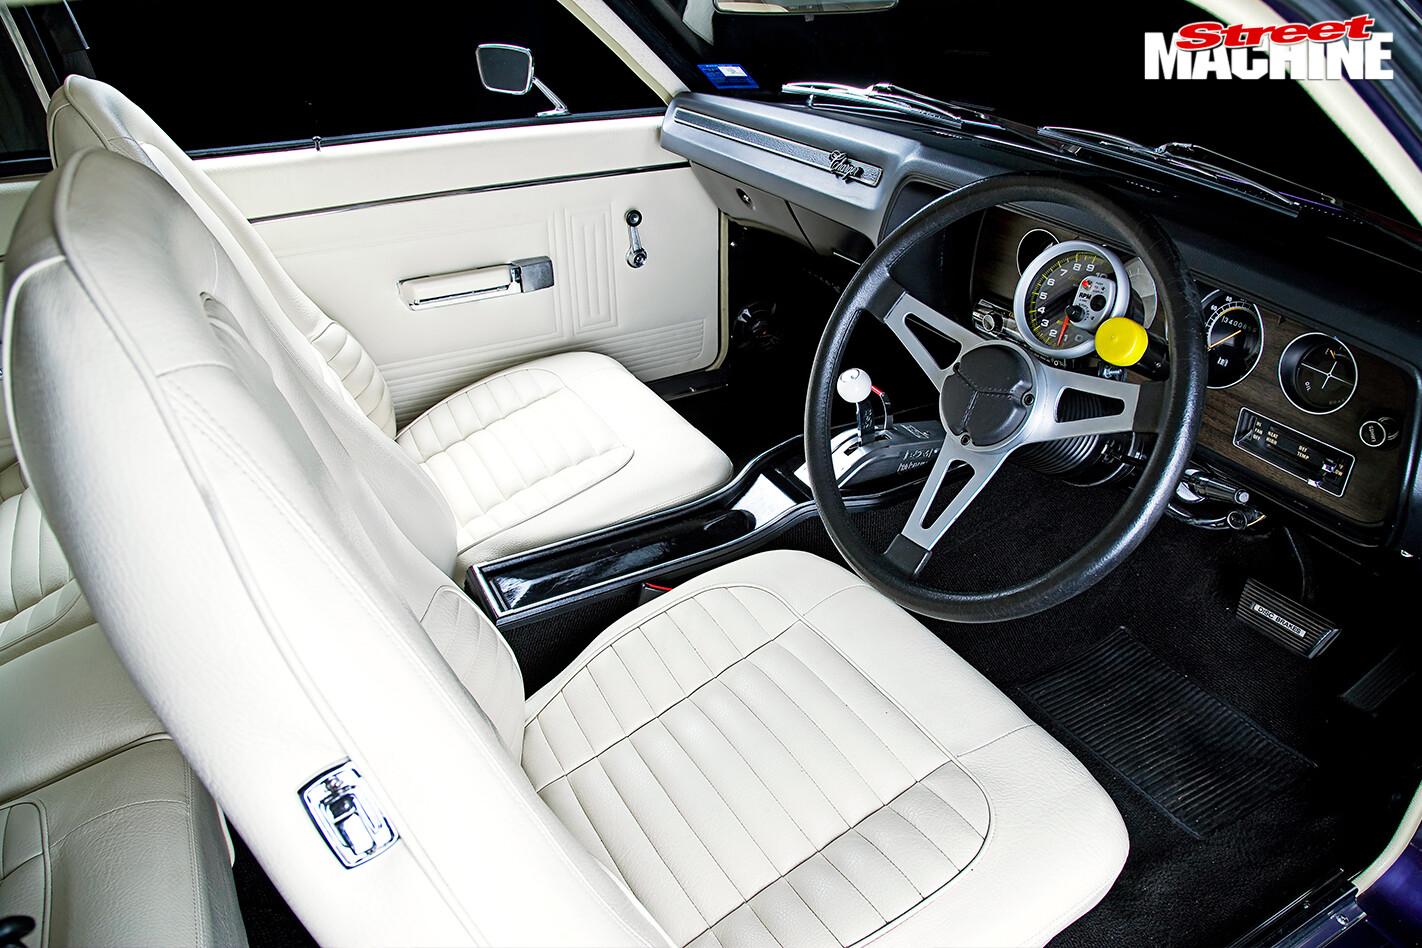 Chrysler -vk -valiant -charger -interior -front -drivers -side